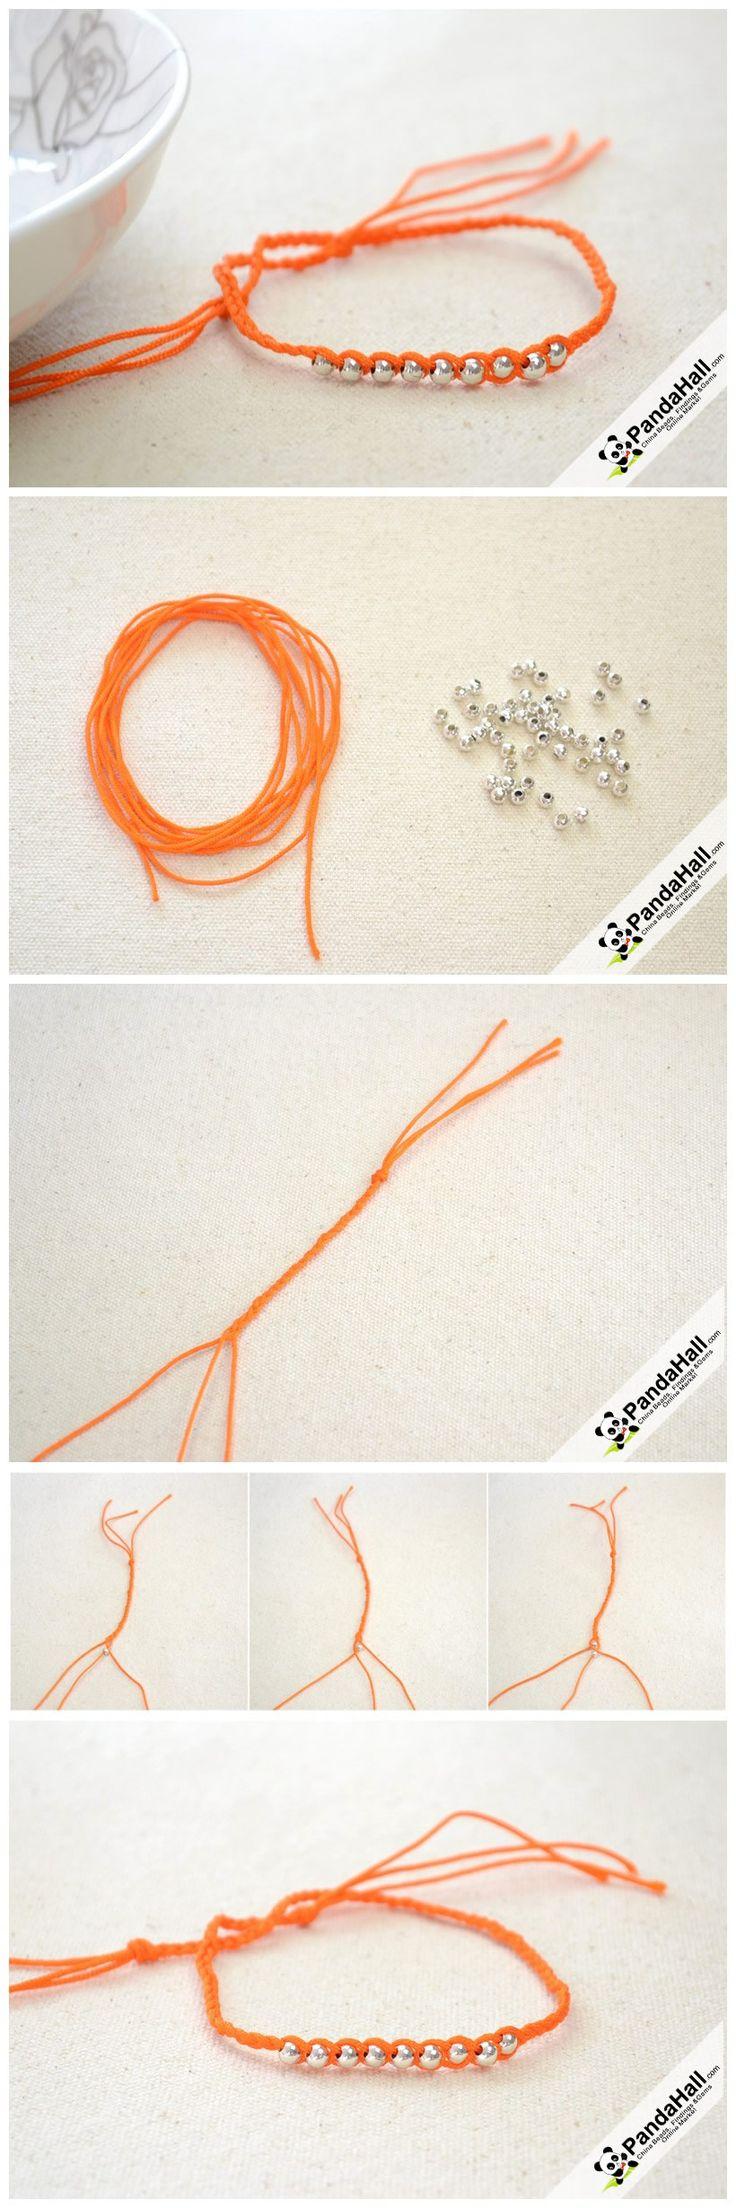 Easy to Make Friendship Bracelet - How to Make String Bracelets Step by Step from pandahall.com